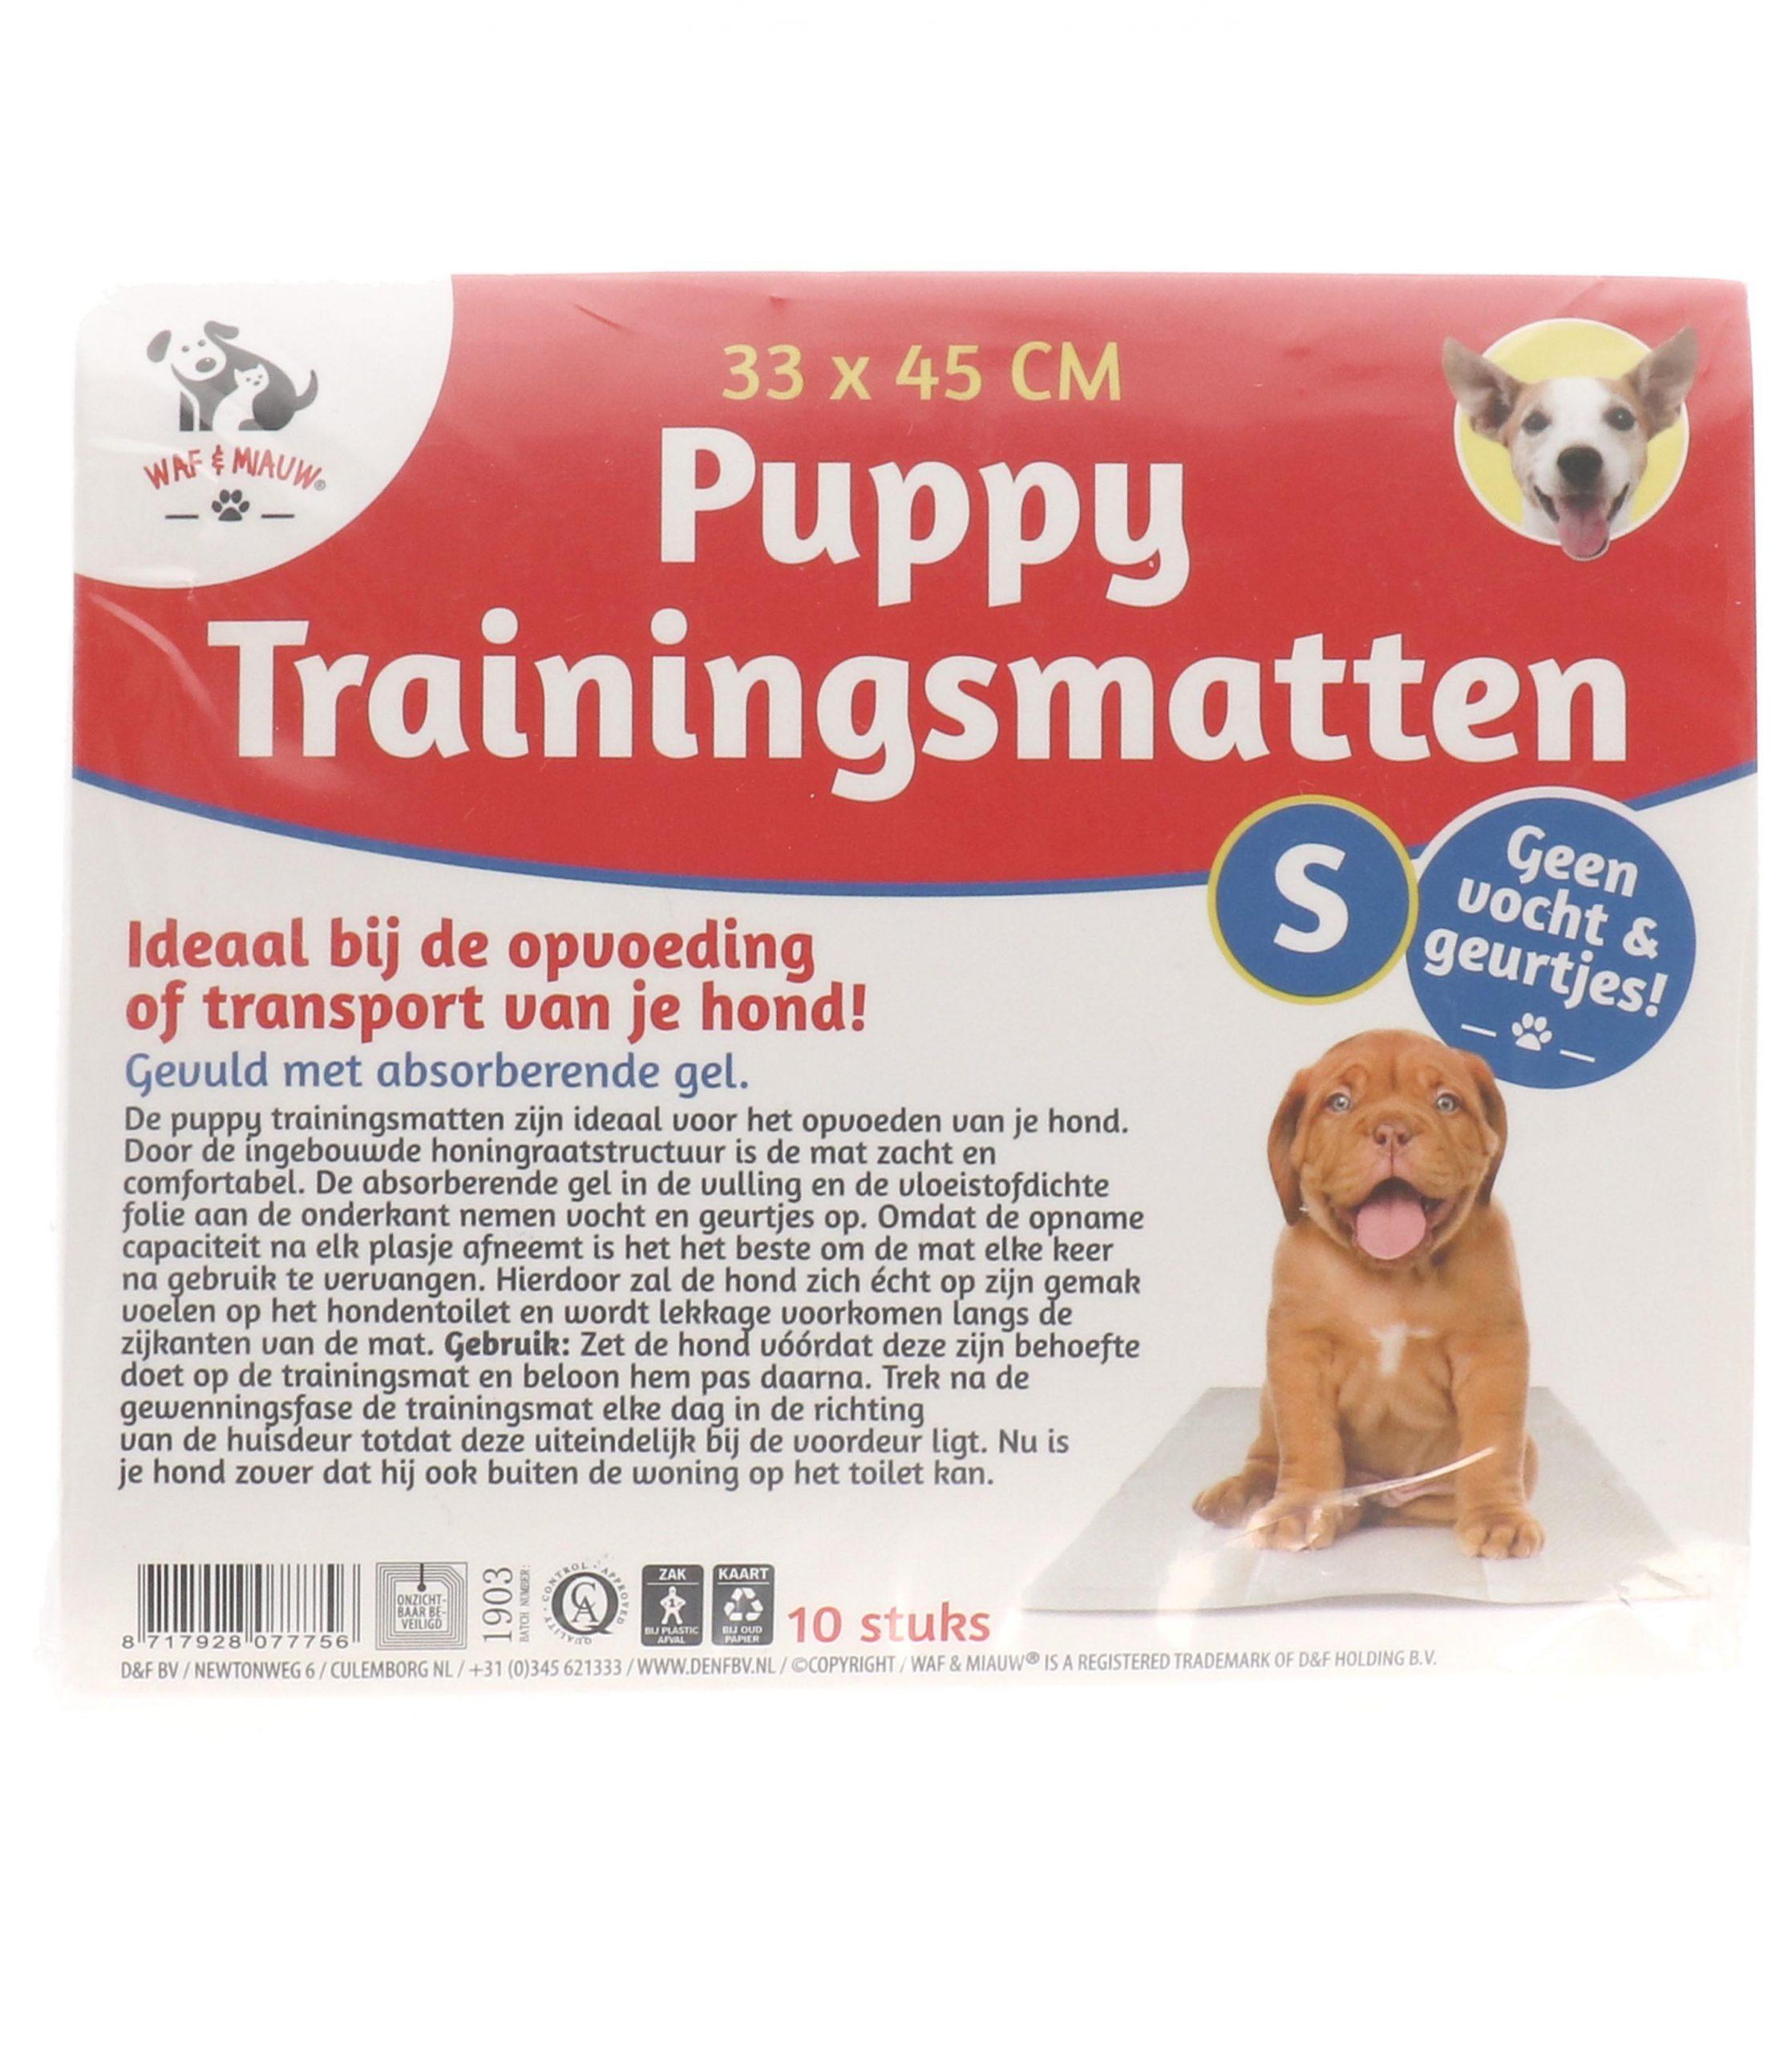 Puppy trainingsmat 10 stuks 33x45